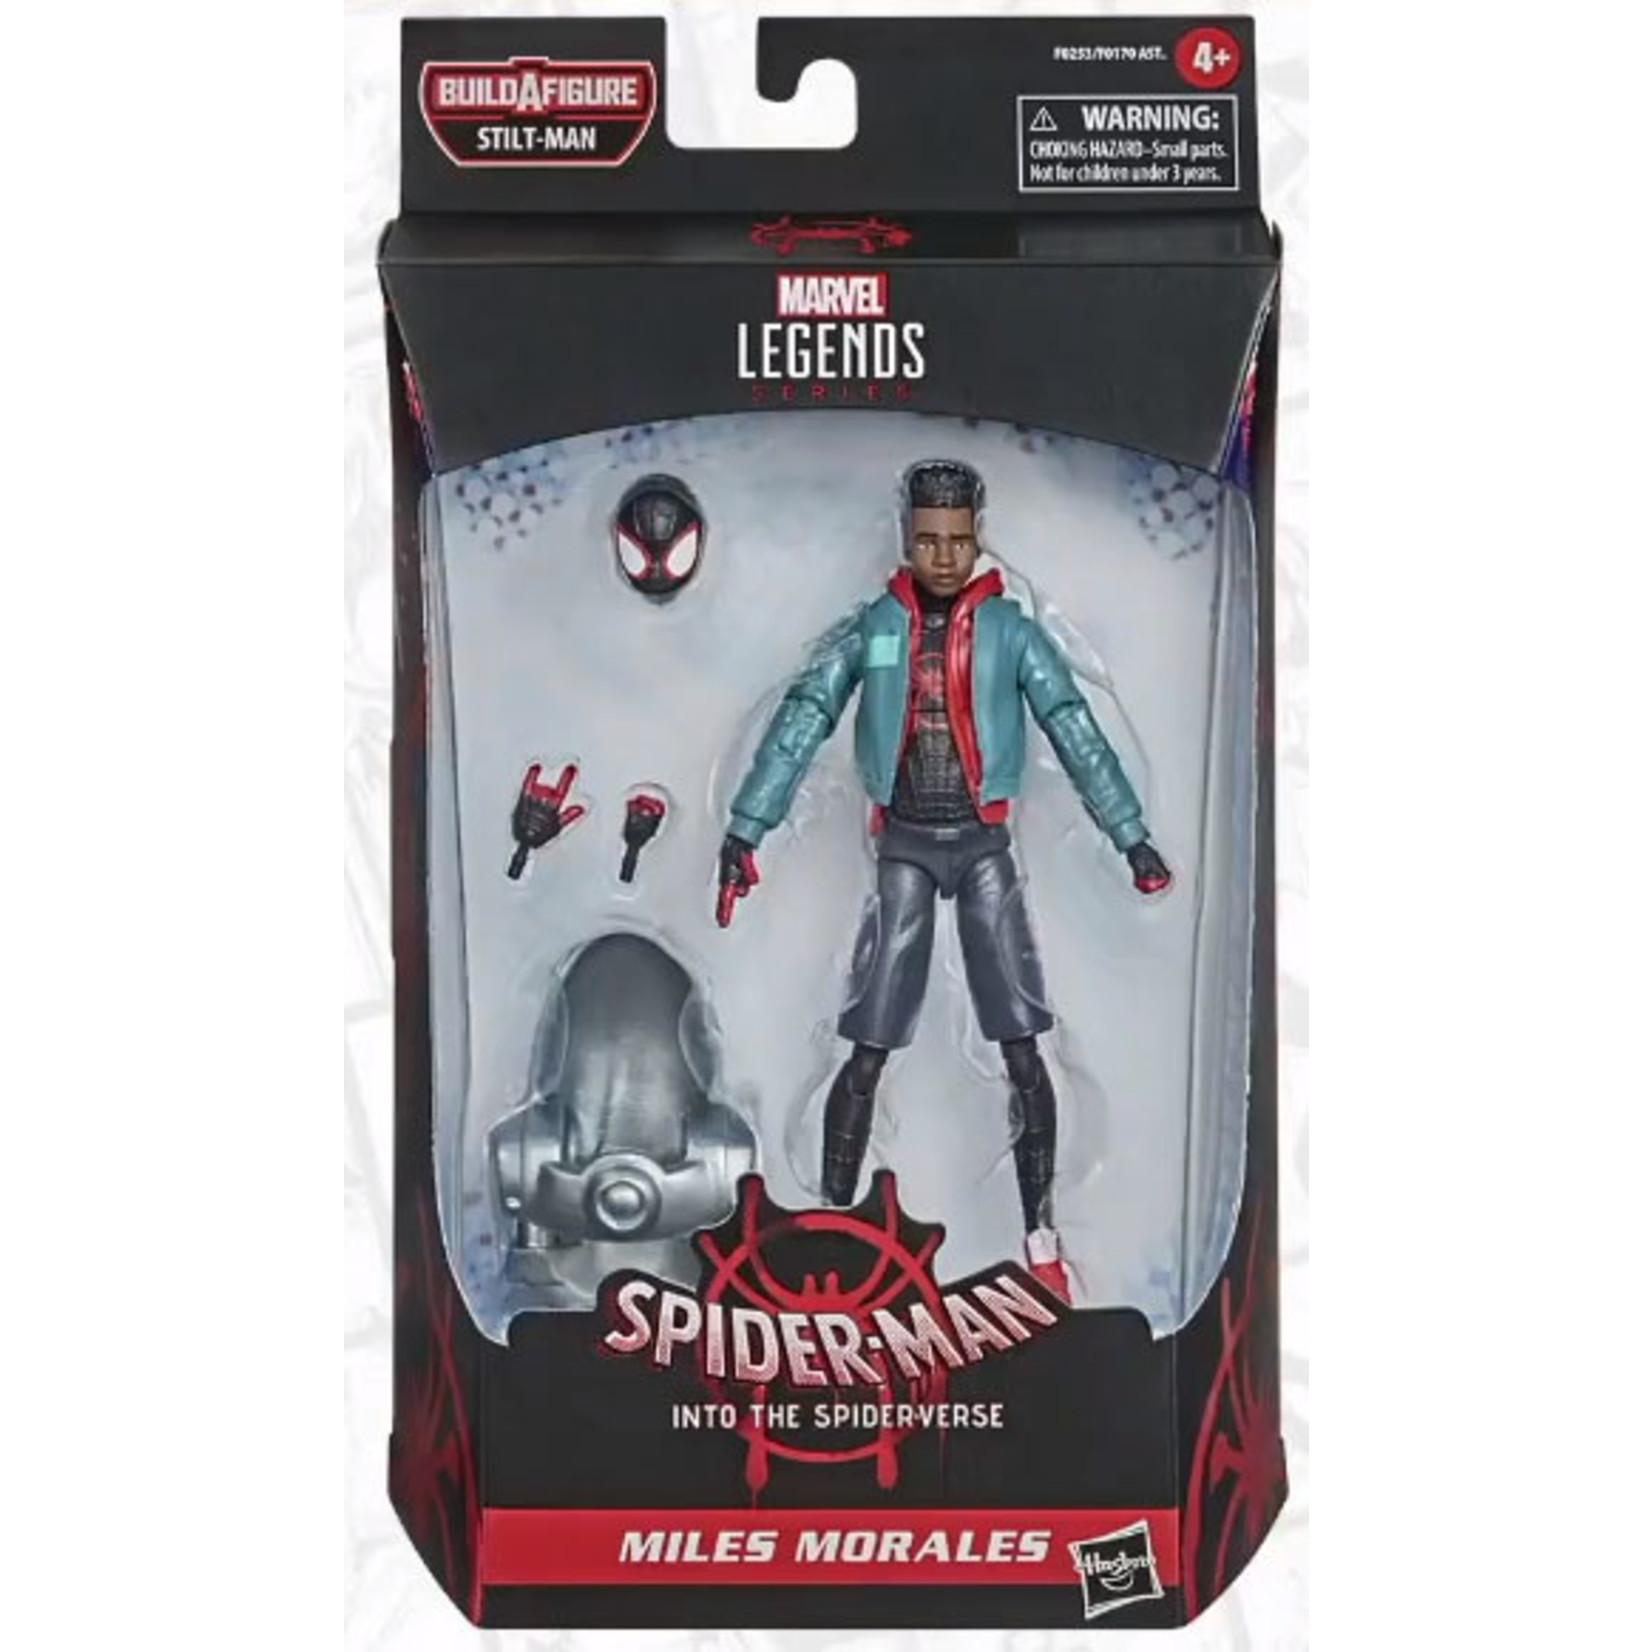 Hasbro Spider-Man: Into the Spider-Verse Marvel Legends Miles Morales (Stilt-Man BAF)